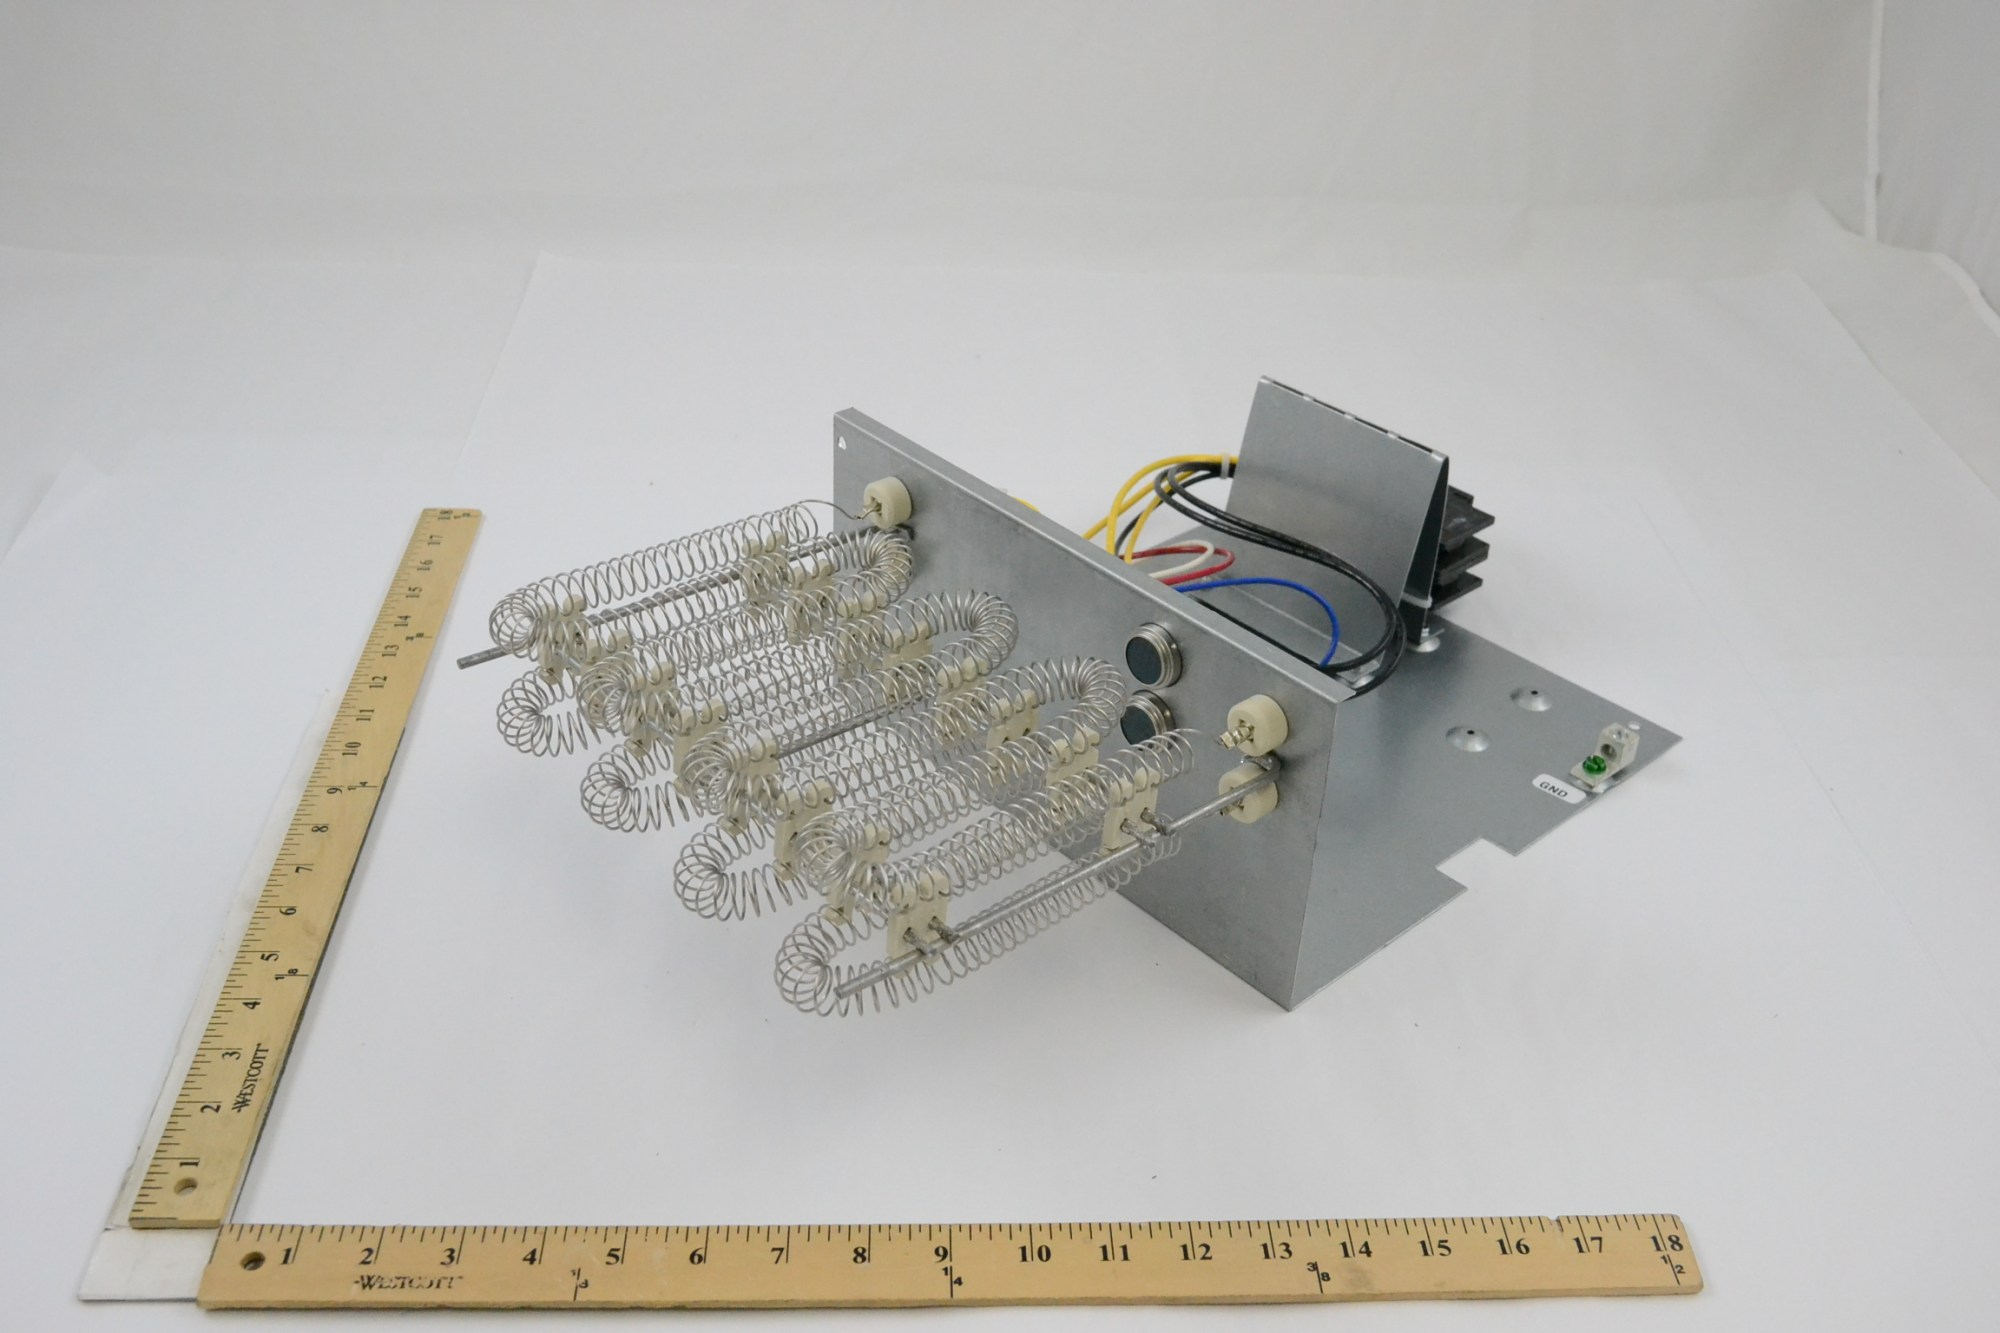 hight resolution of armstrong furnace aehbcc07csa 1 heat strip kit 7 5kw goodman furnace wiring diagram heat pump heat